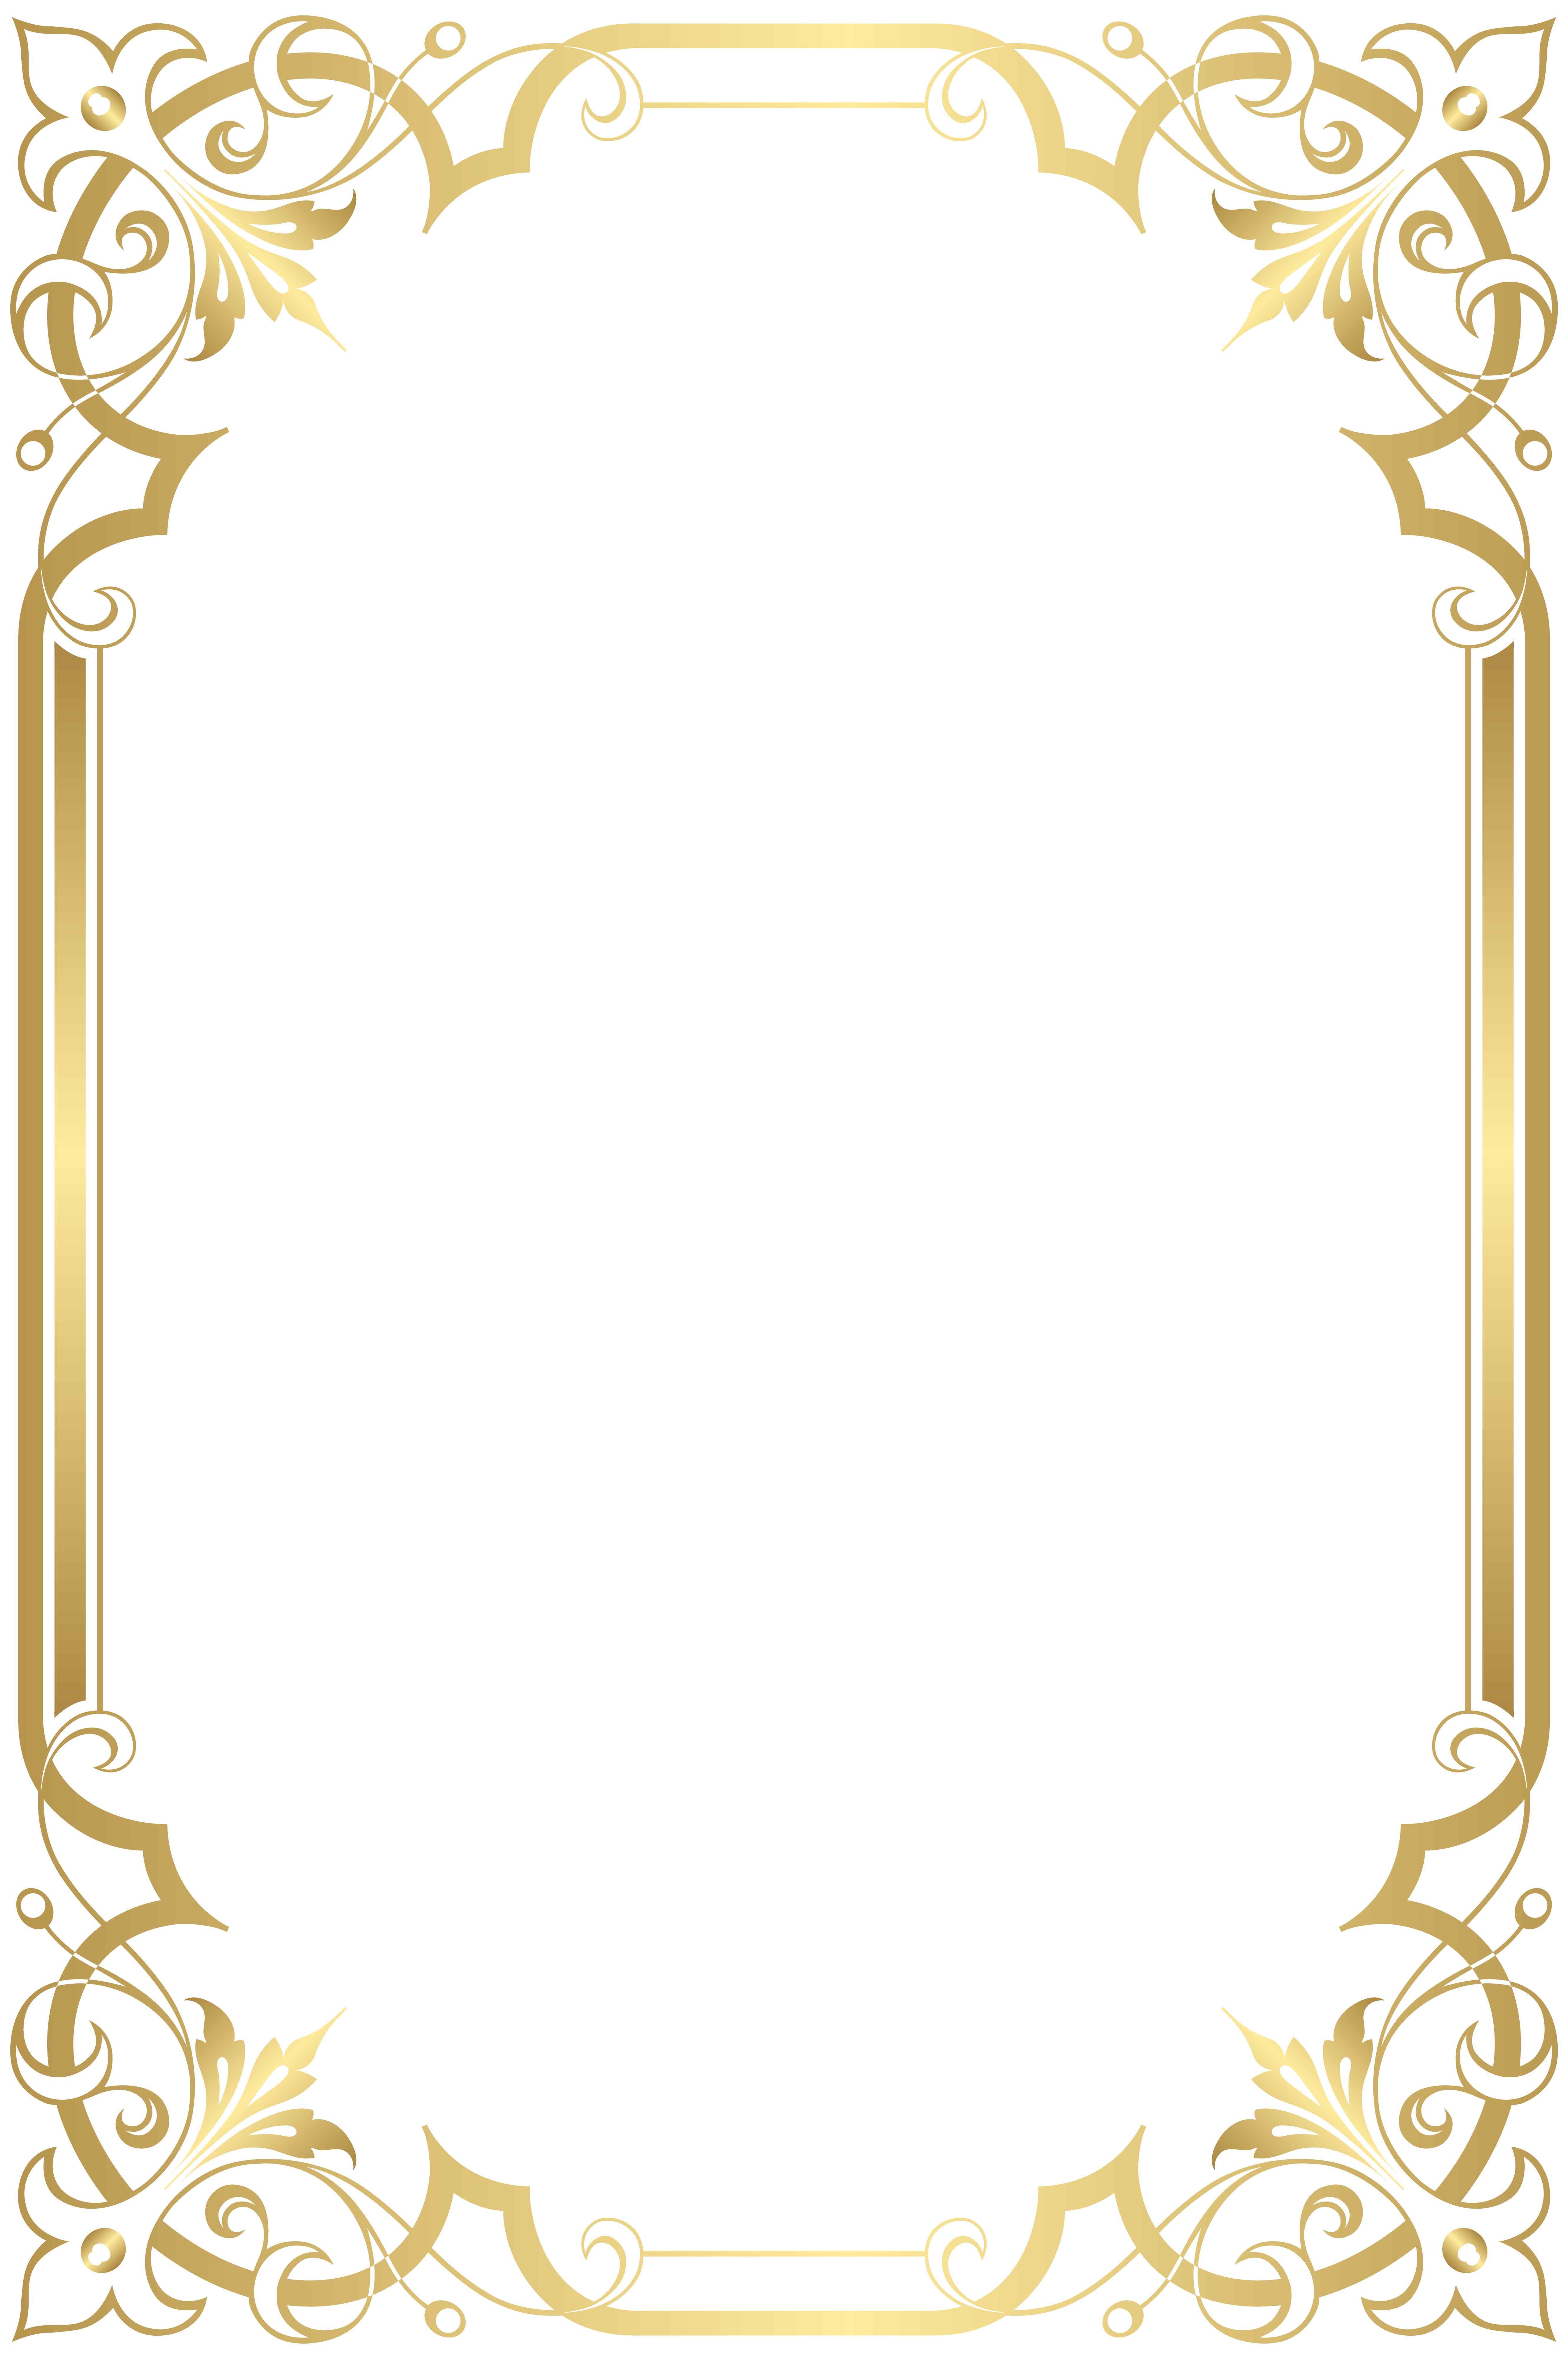 Envelope clipart border. Frame transparent clip art